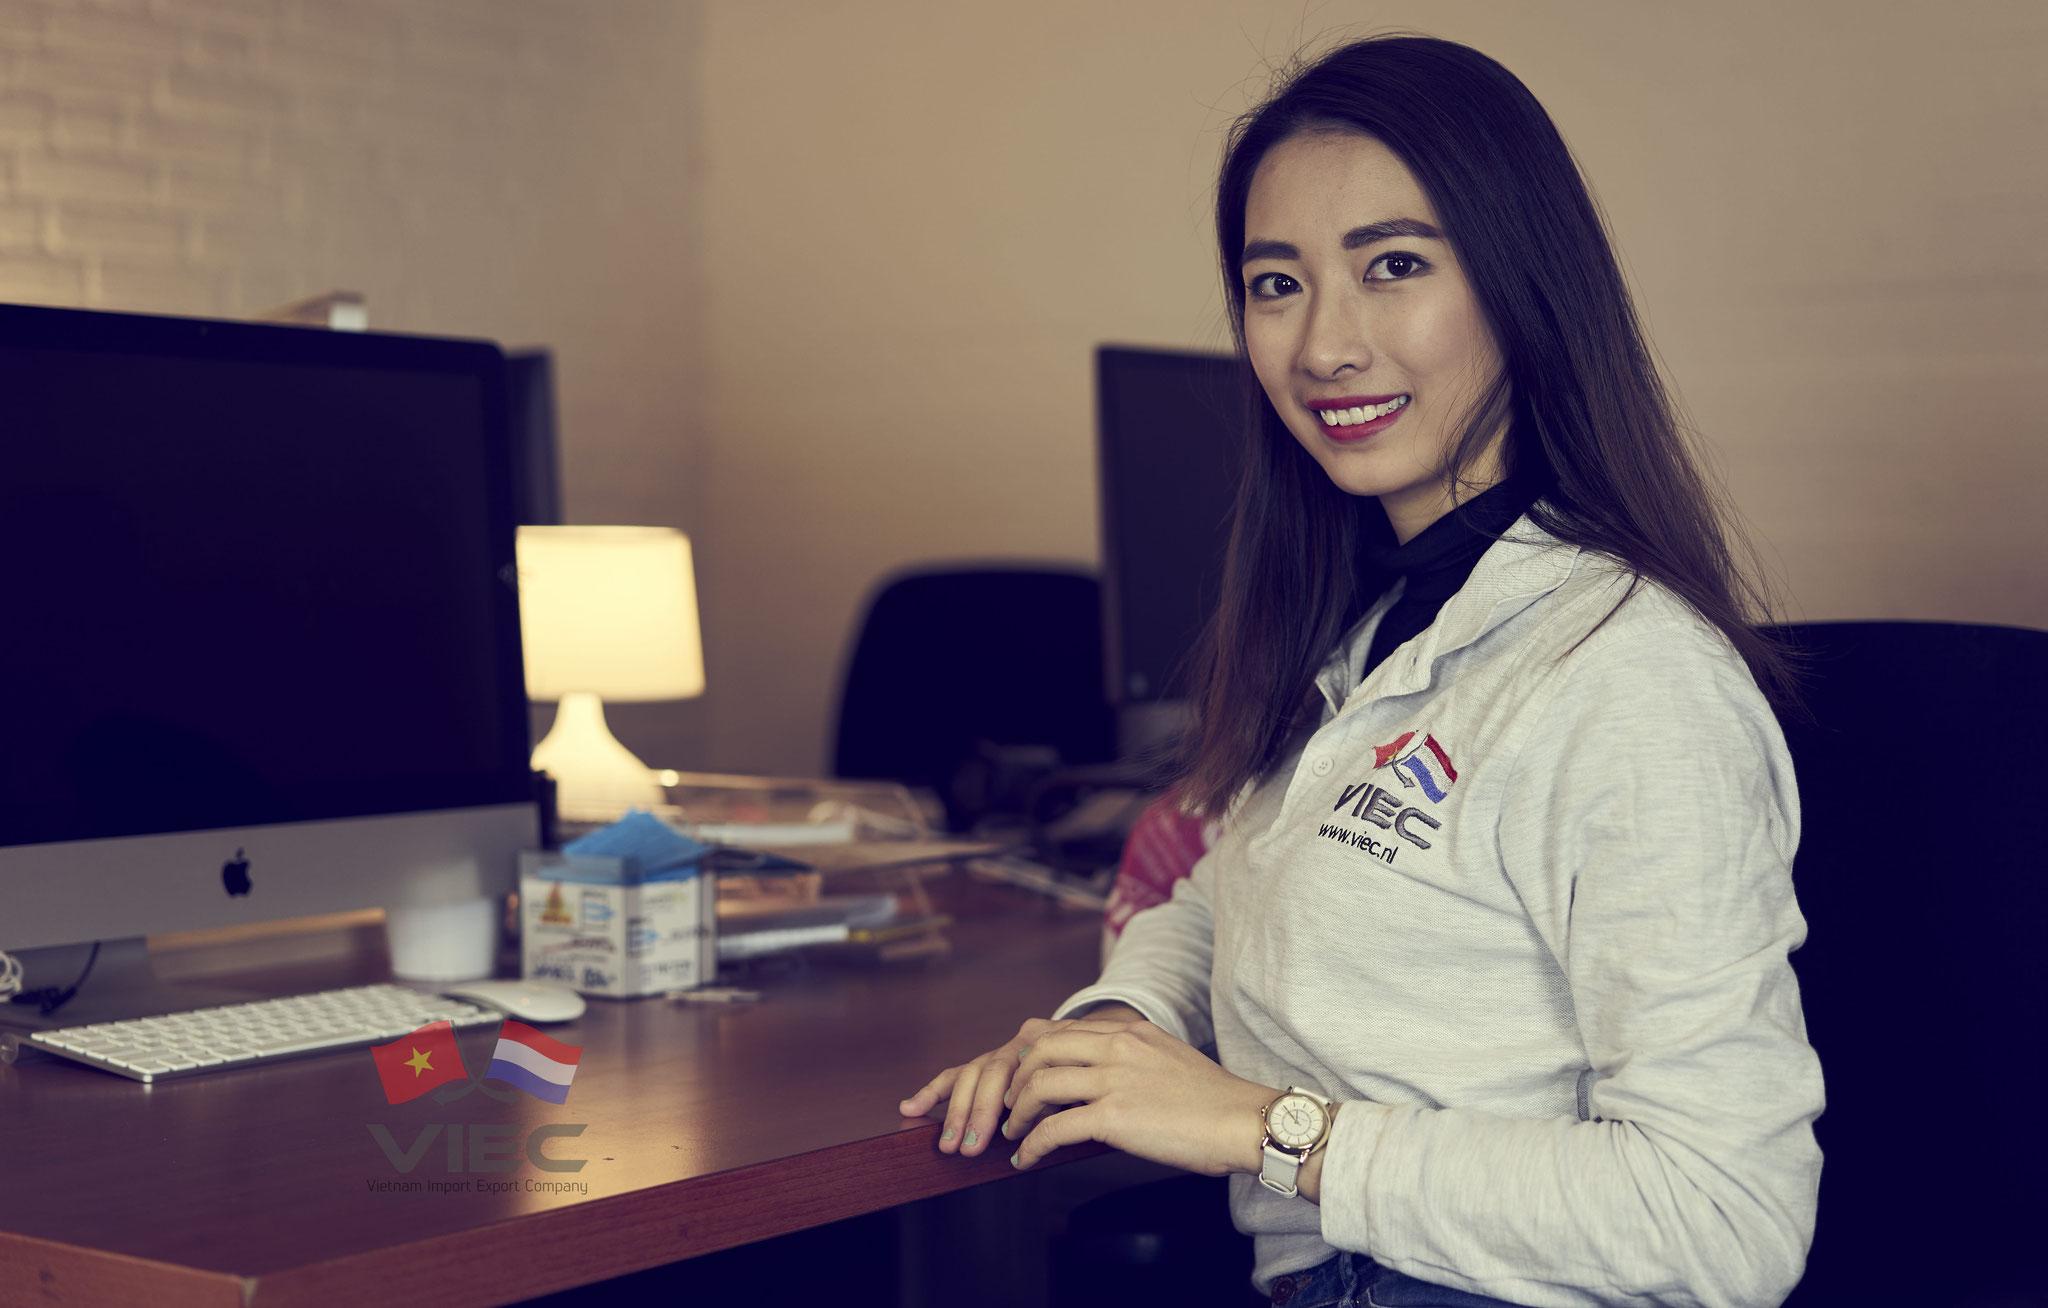 Mrs. Anna Phuong Nguyen 🙎🏻♀Sales Executive  🇬🇧English & 🇻🇳Tiếng Việt   ☎+31 (0) 6 5926 6788   📩 Export@viec.nl